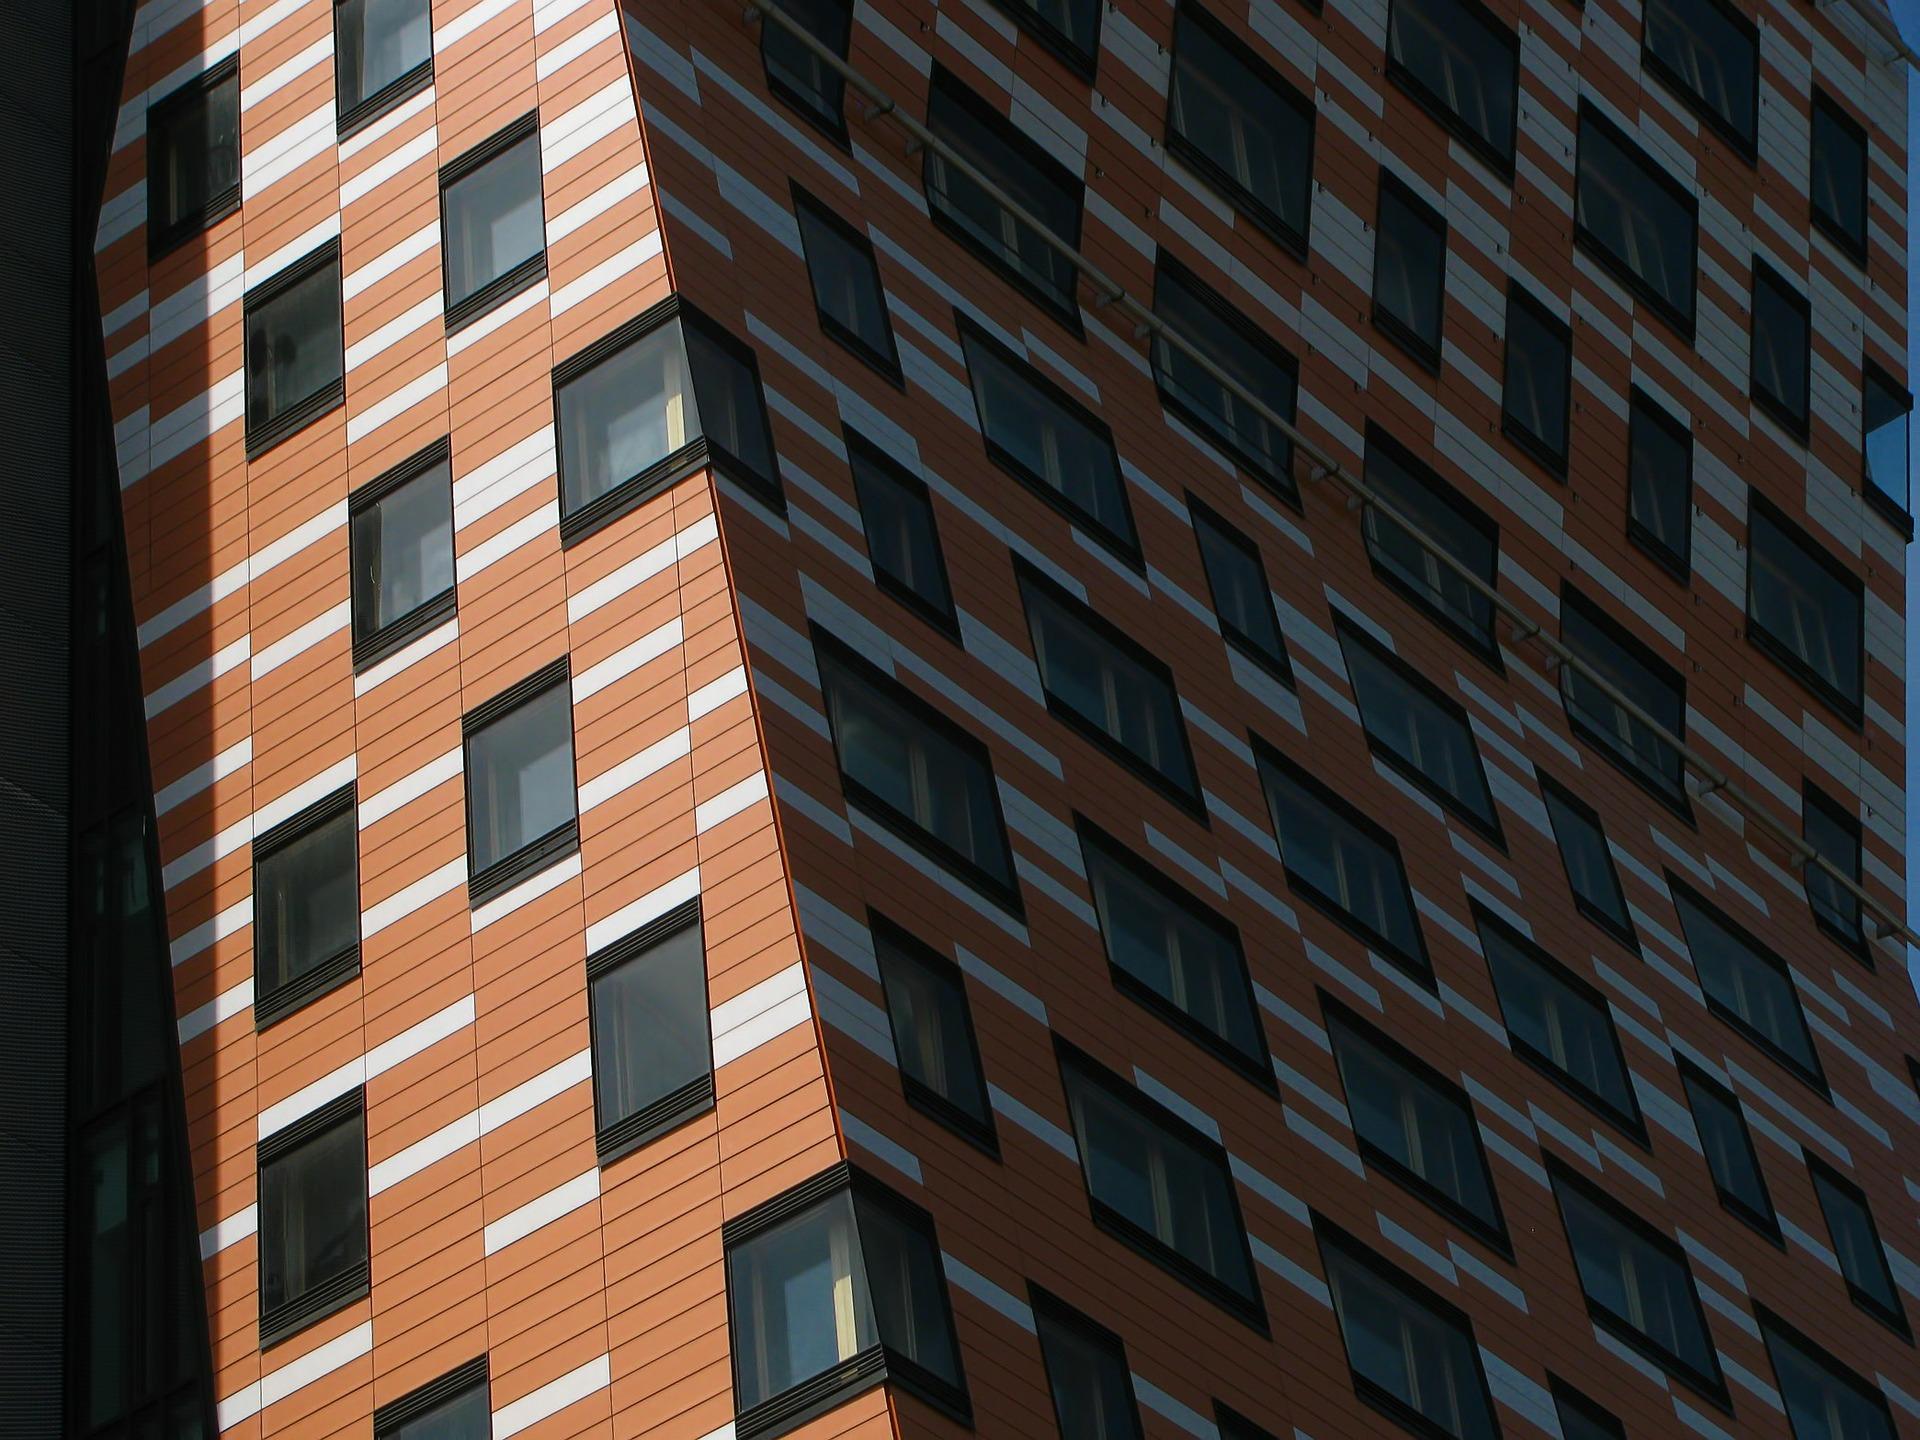 building-212526_1920